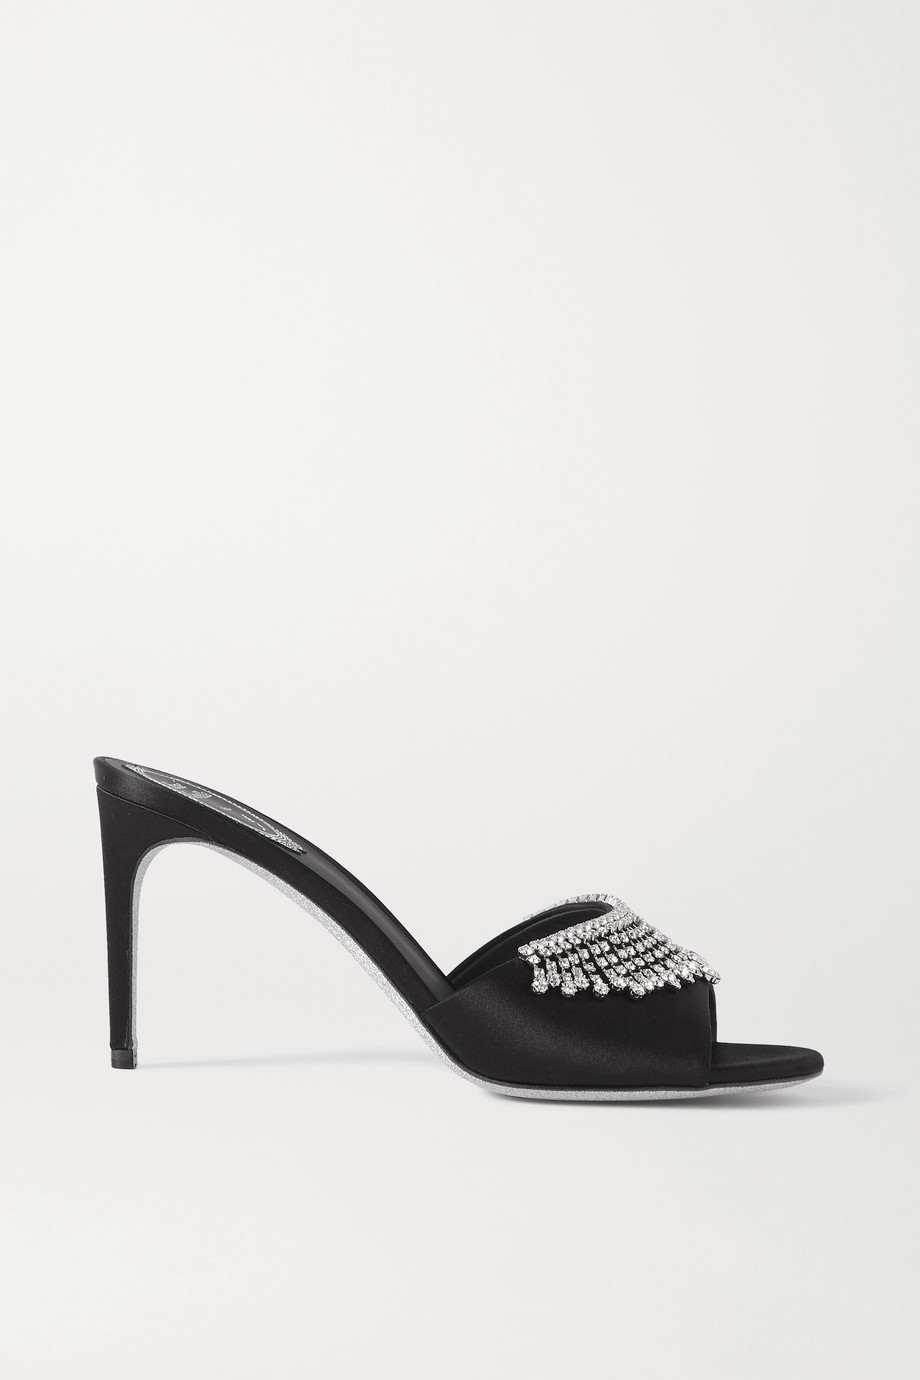 René Caovilla 水晶缀饰缎布穆勒鞋